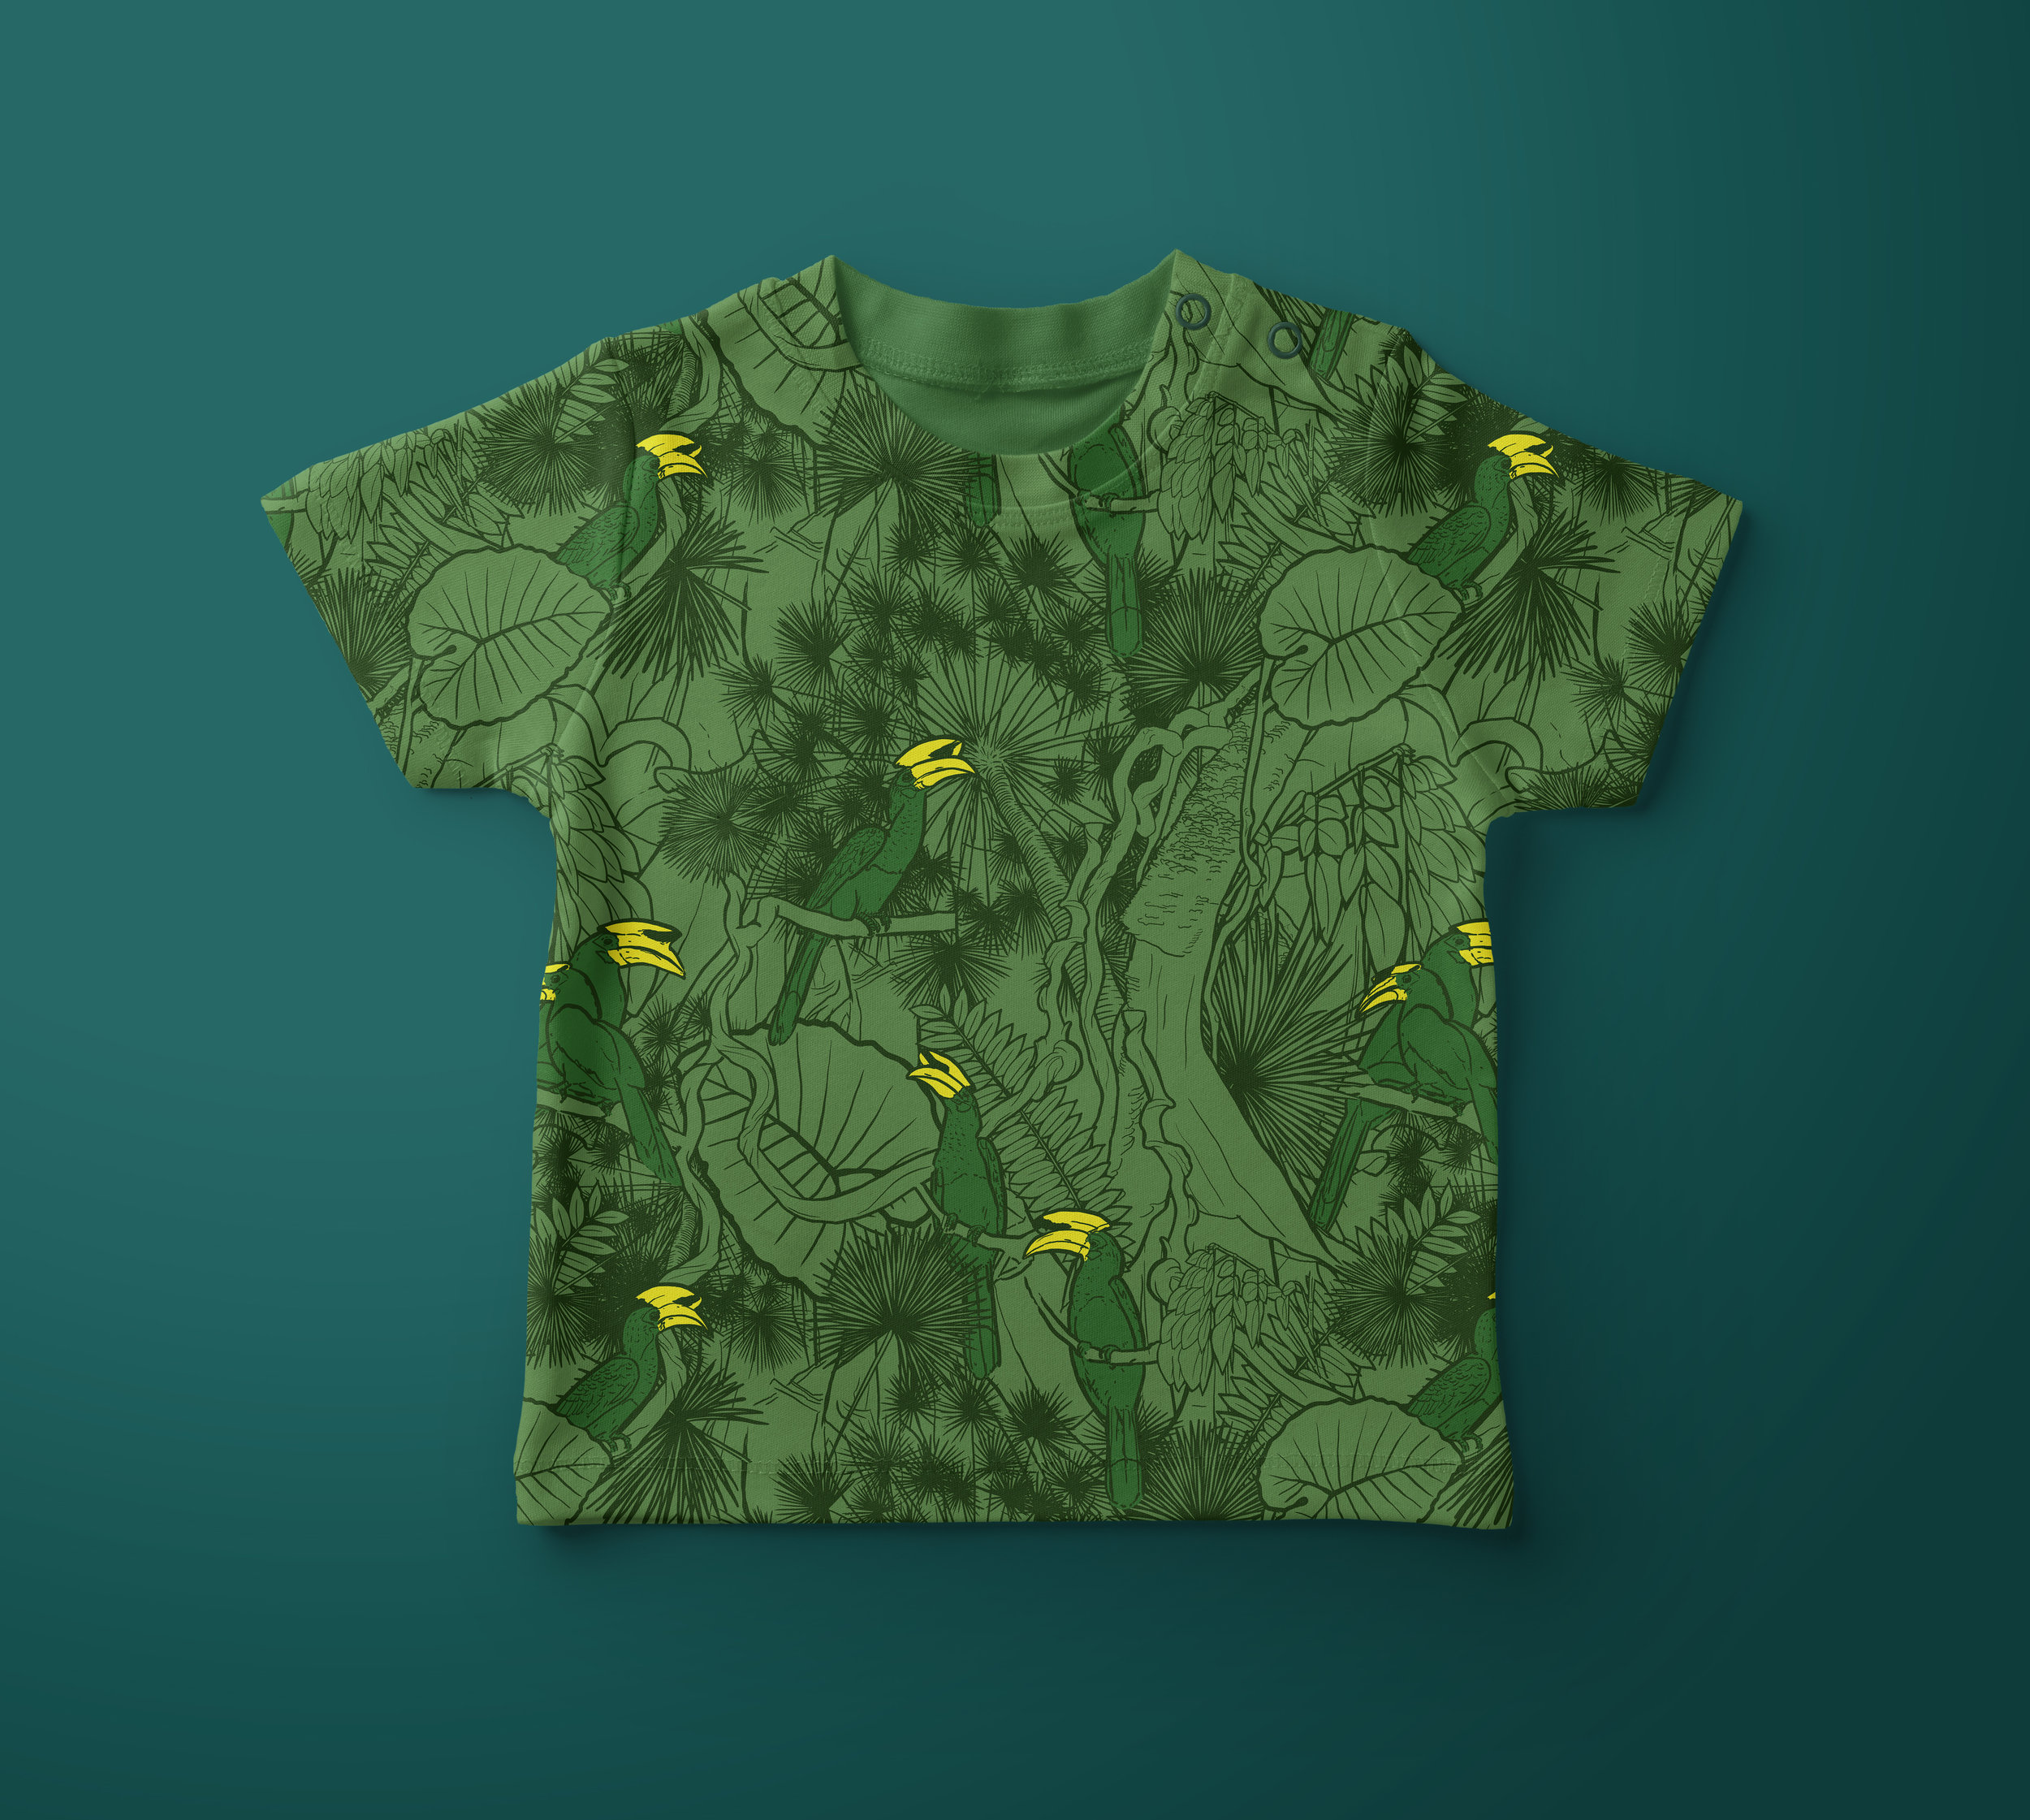 Baby-T-Shirt-Mockup3.jpg